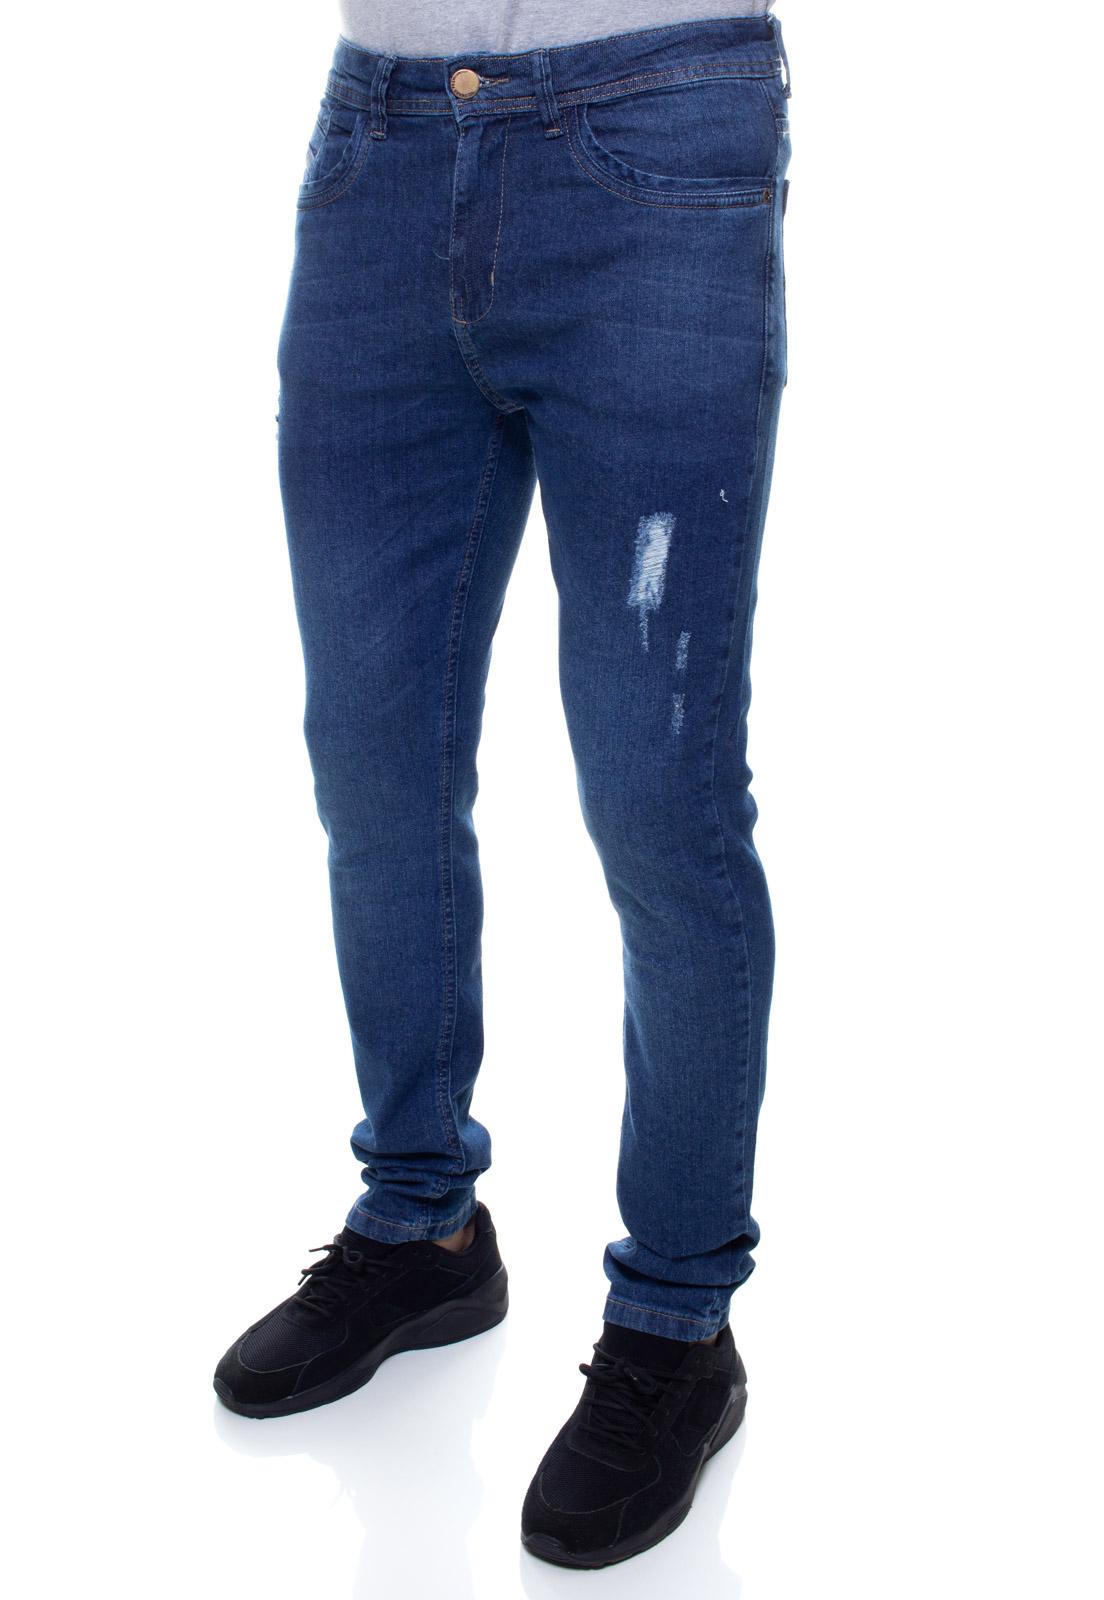 Calça Confort Jeans Masculina Crocker - 48064  - CROCKER JEANS